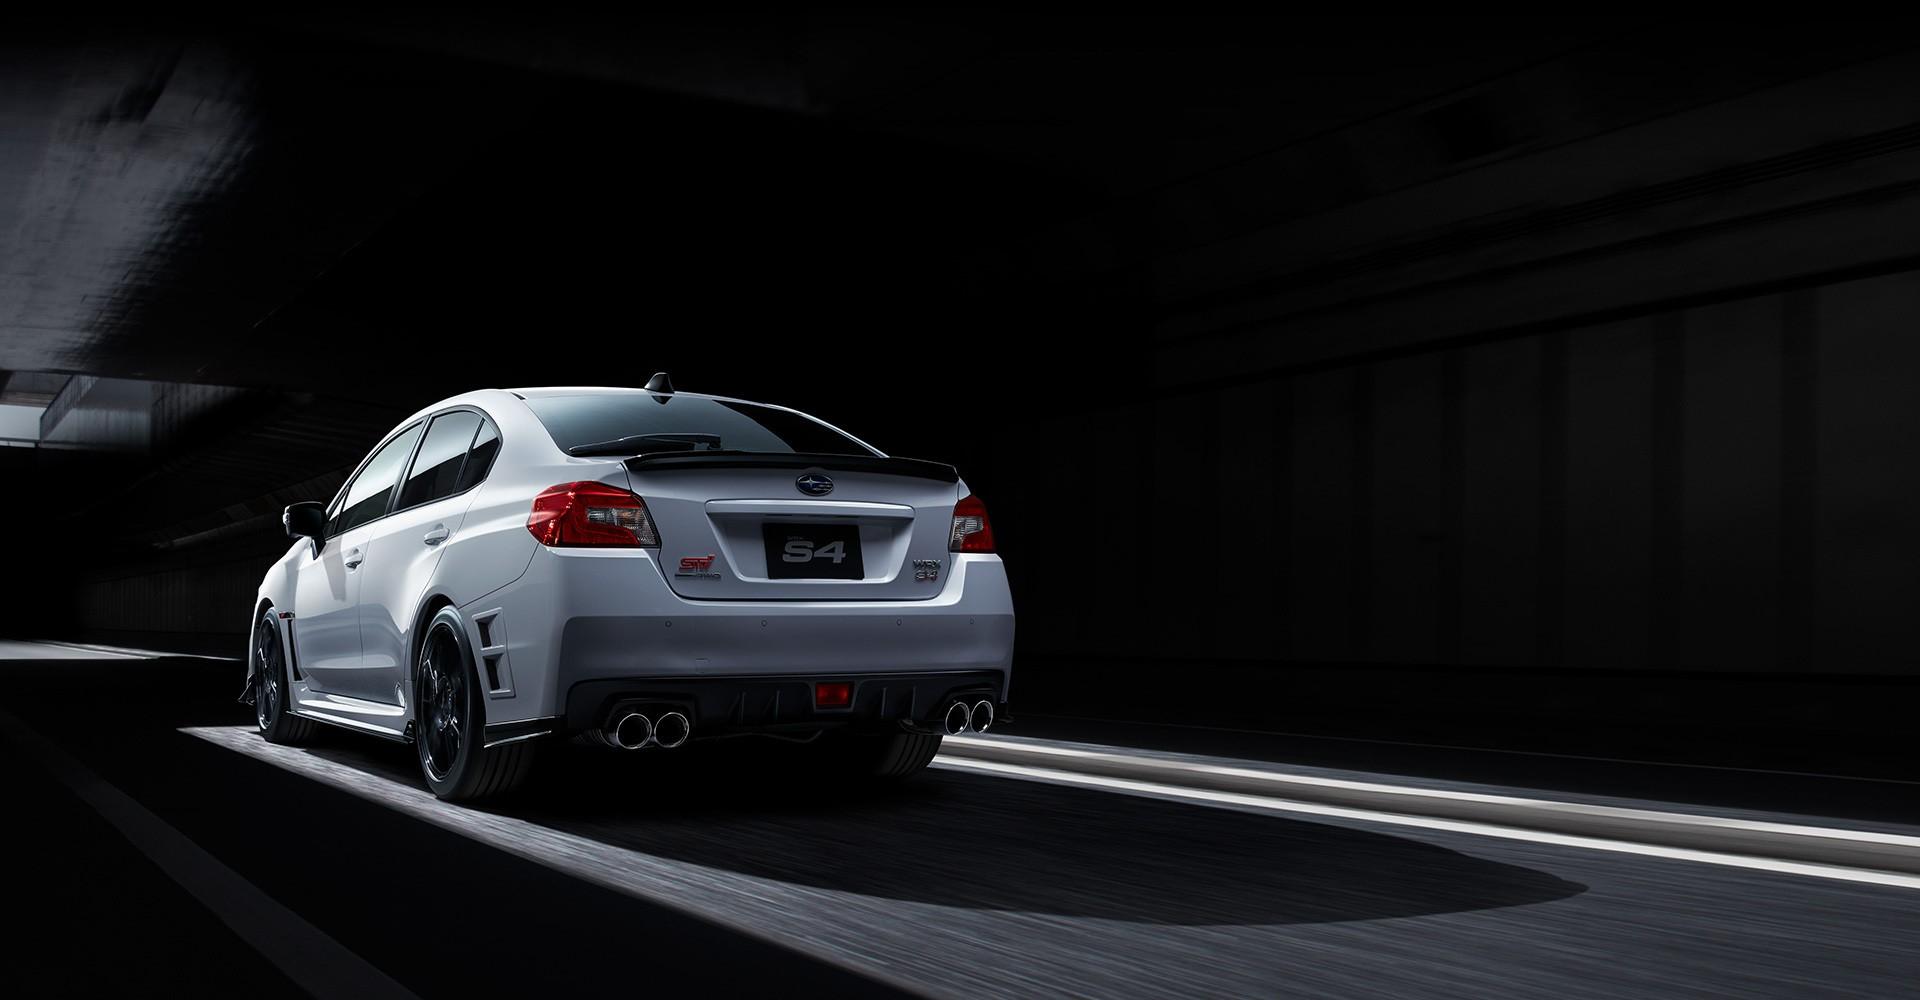 Subaru WRX S4 STI Sport EyeSight 2021 задние фонари